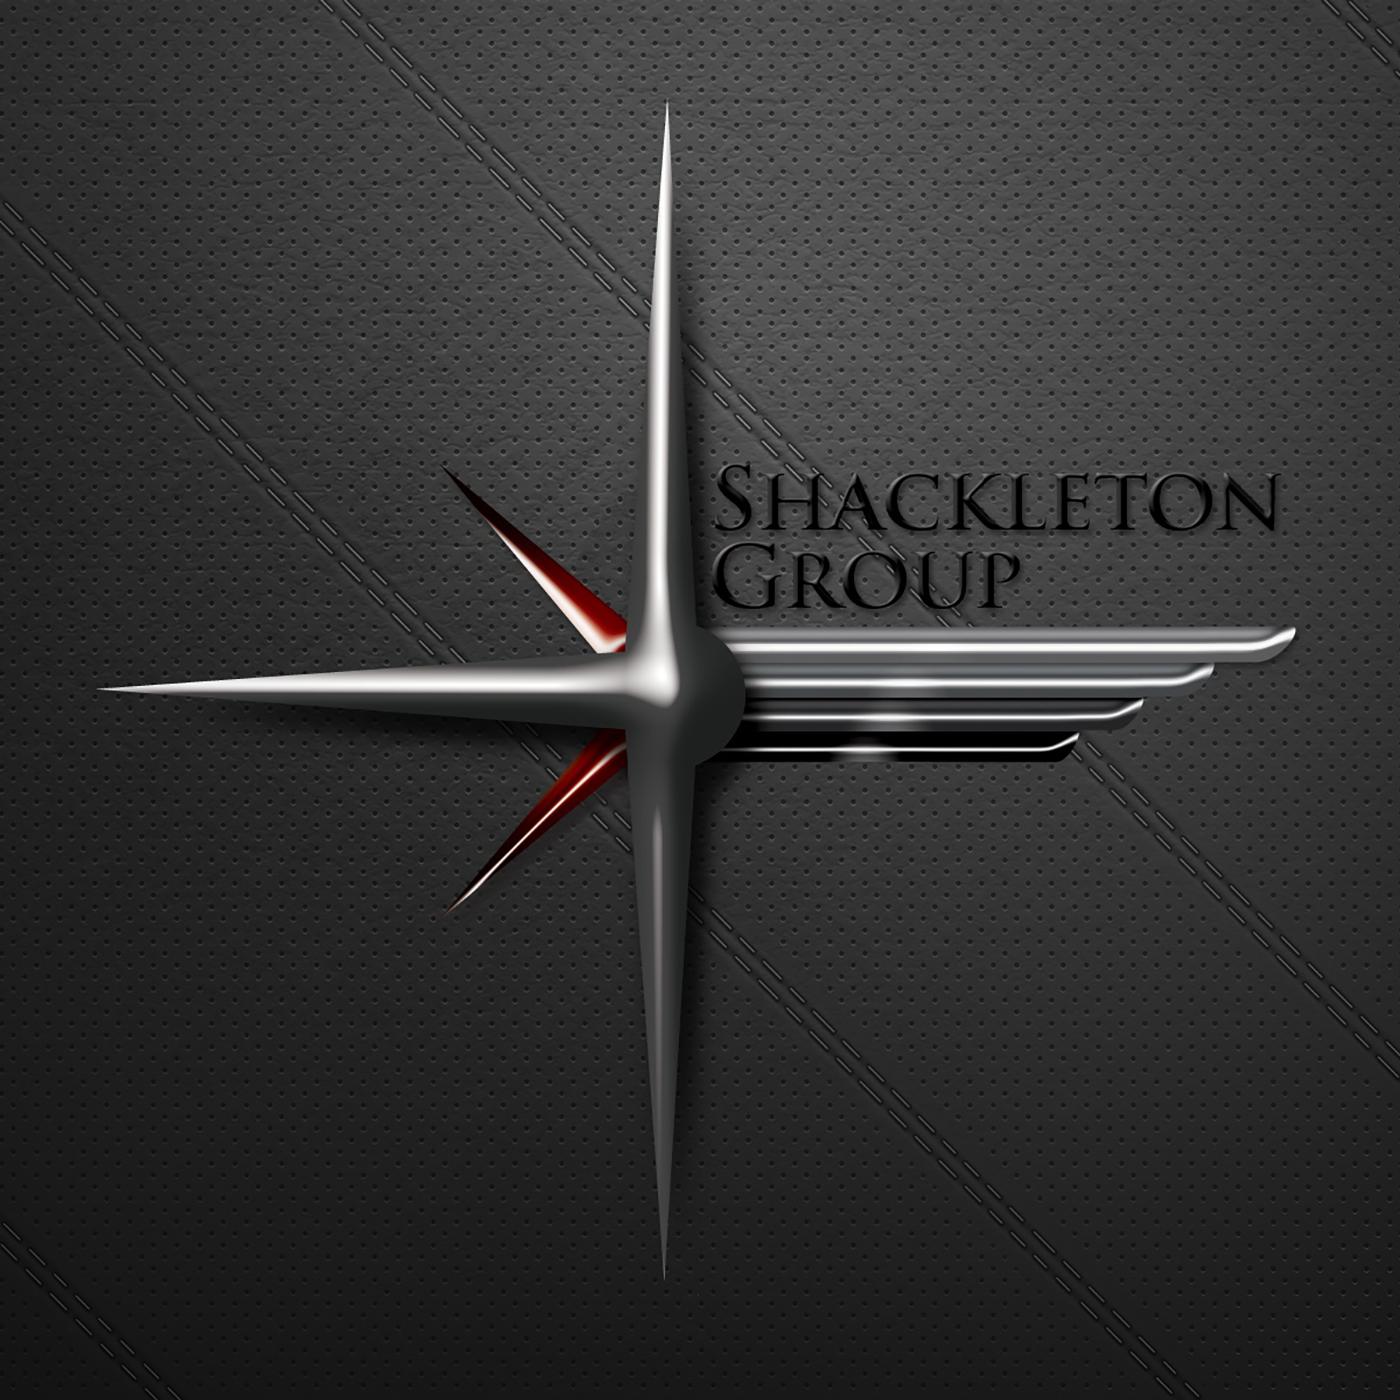 Shackleton Group Podcast